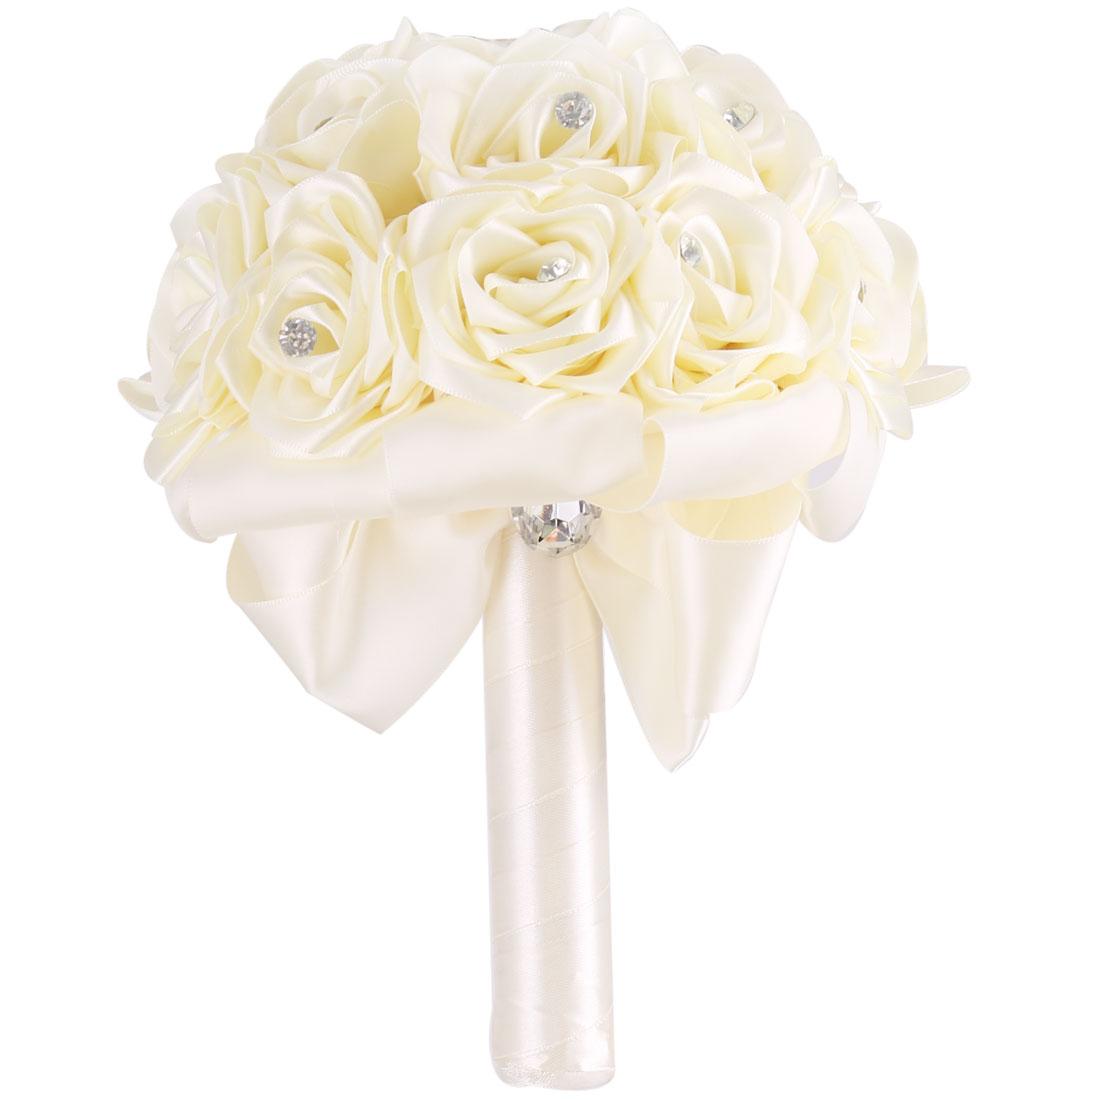 Wedding Party Foam Buds Handhold Roses Bouquet Craft Artificial Flower Decor Beige